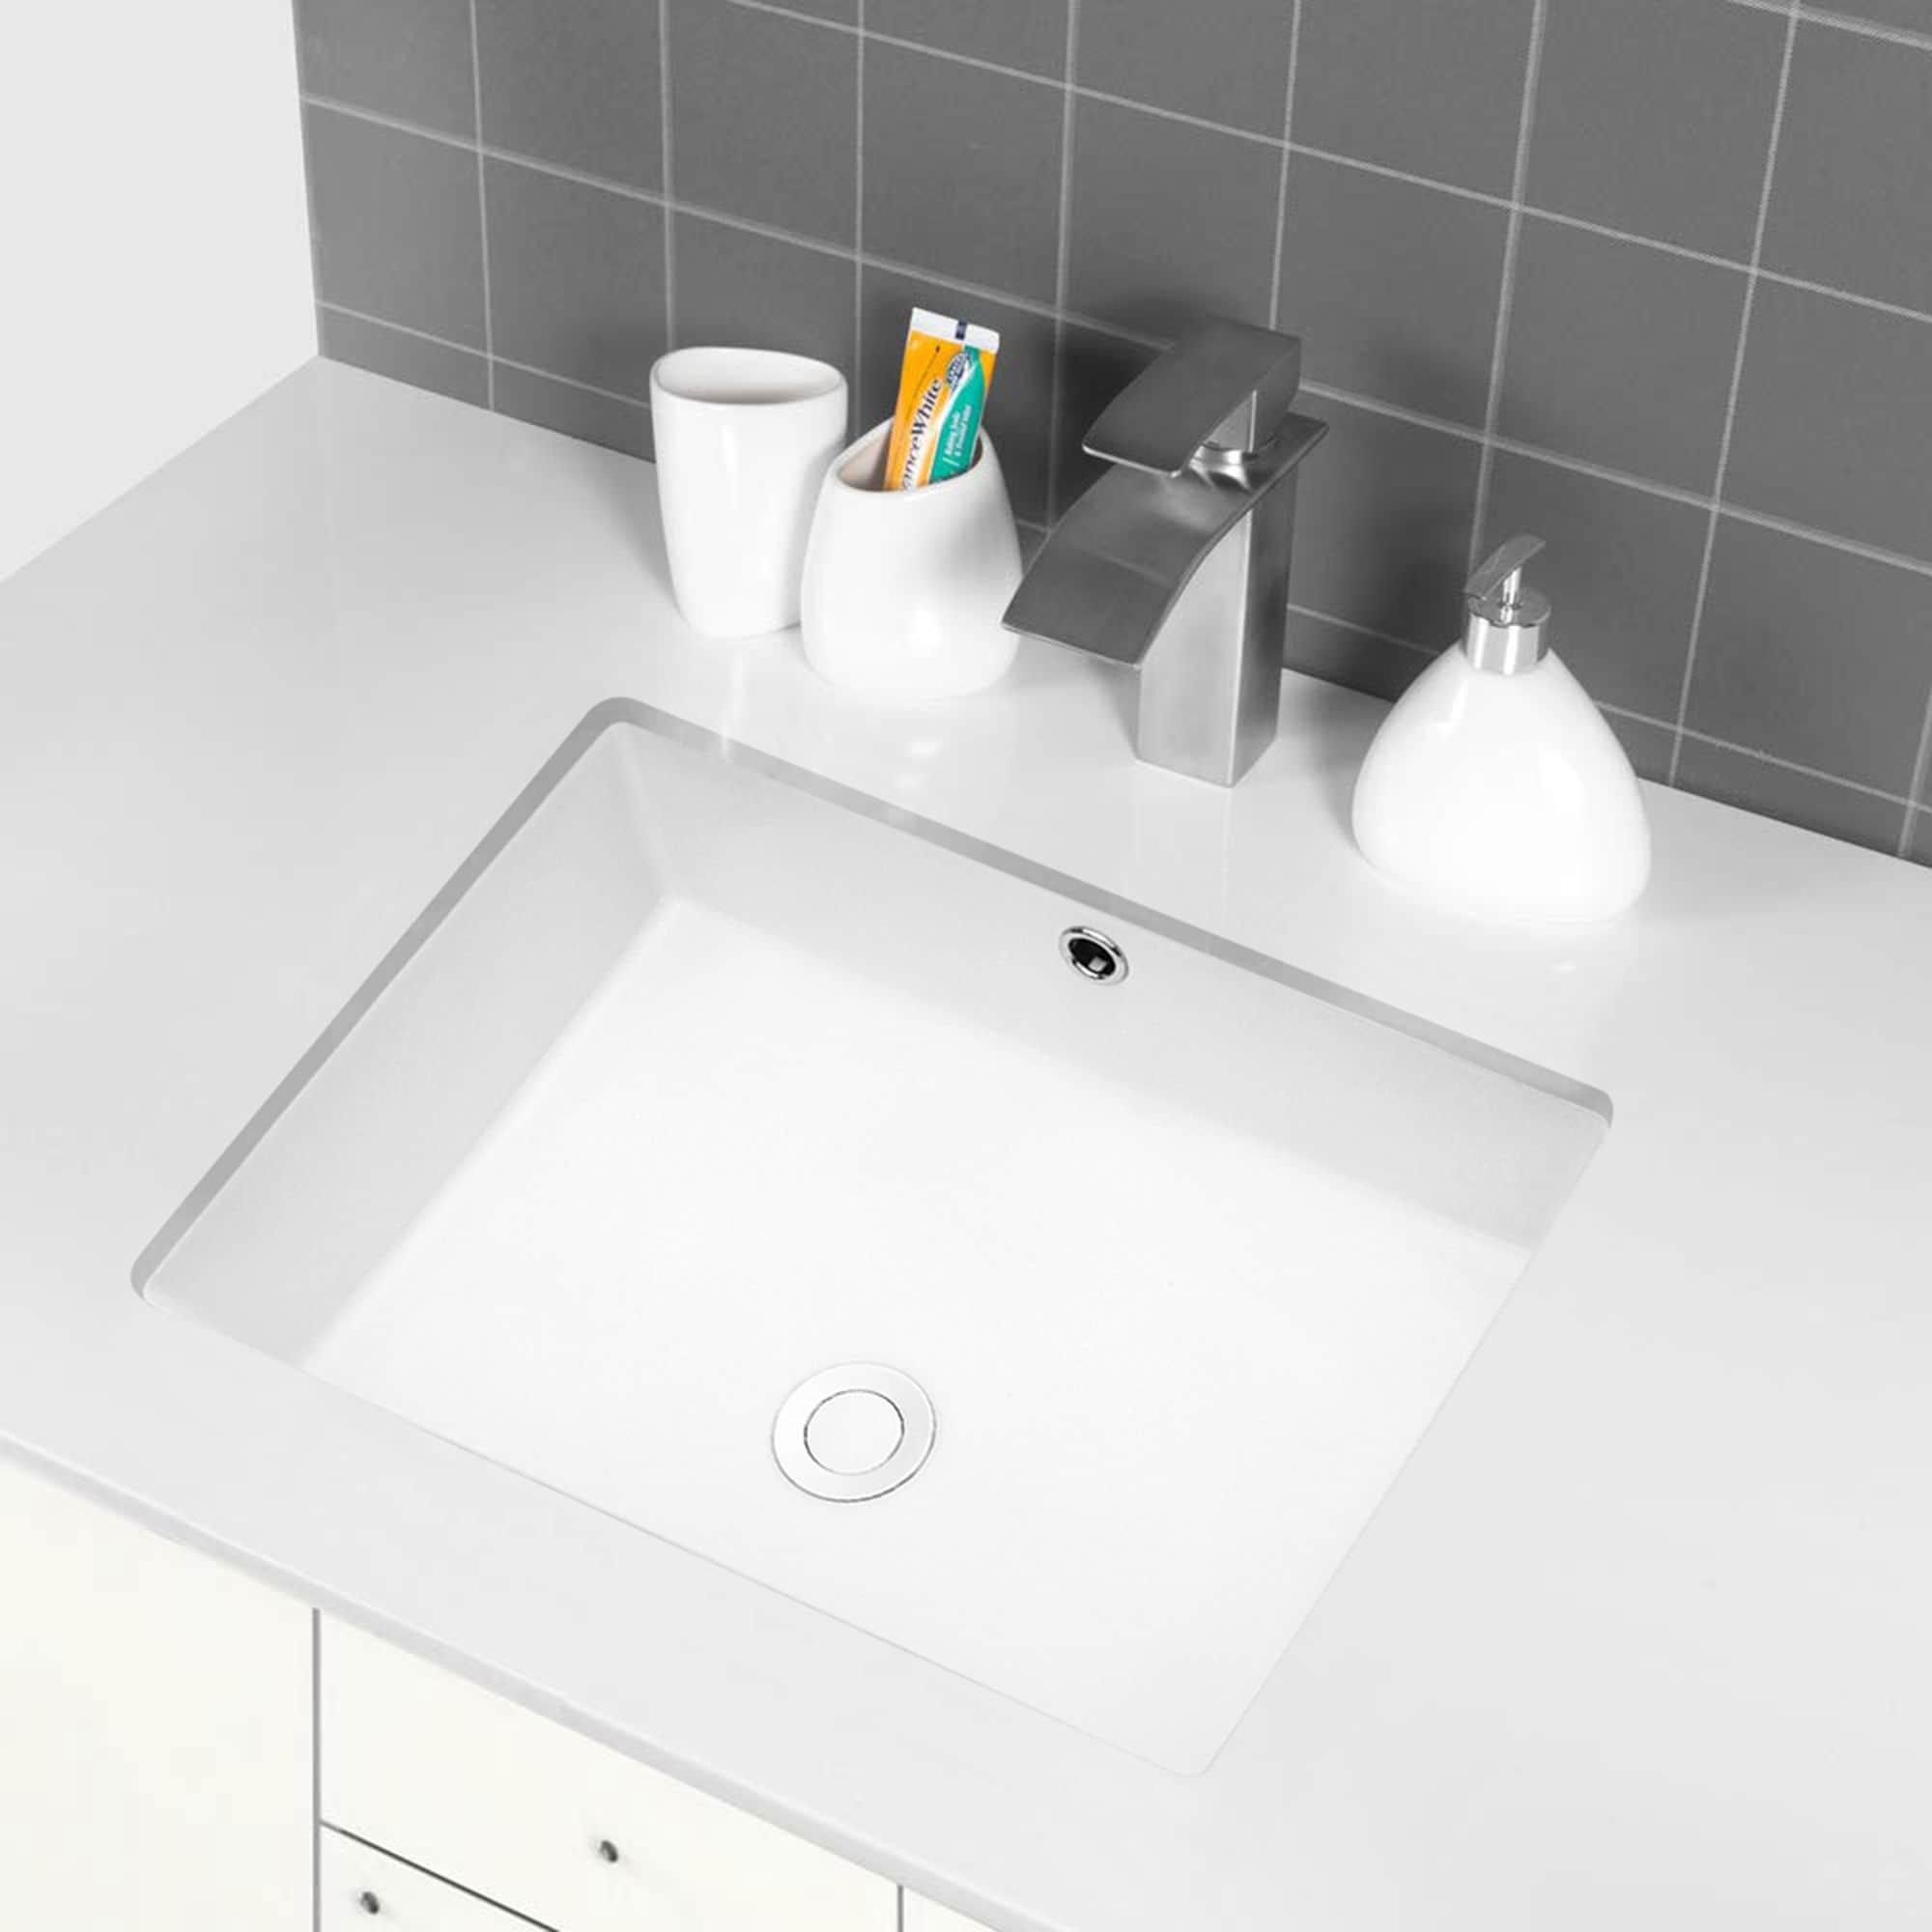 White Rectangular Undermount Bathroom Sink With Overflow Overstock 31636124